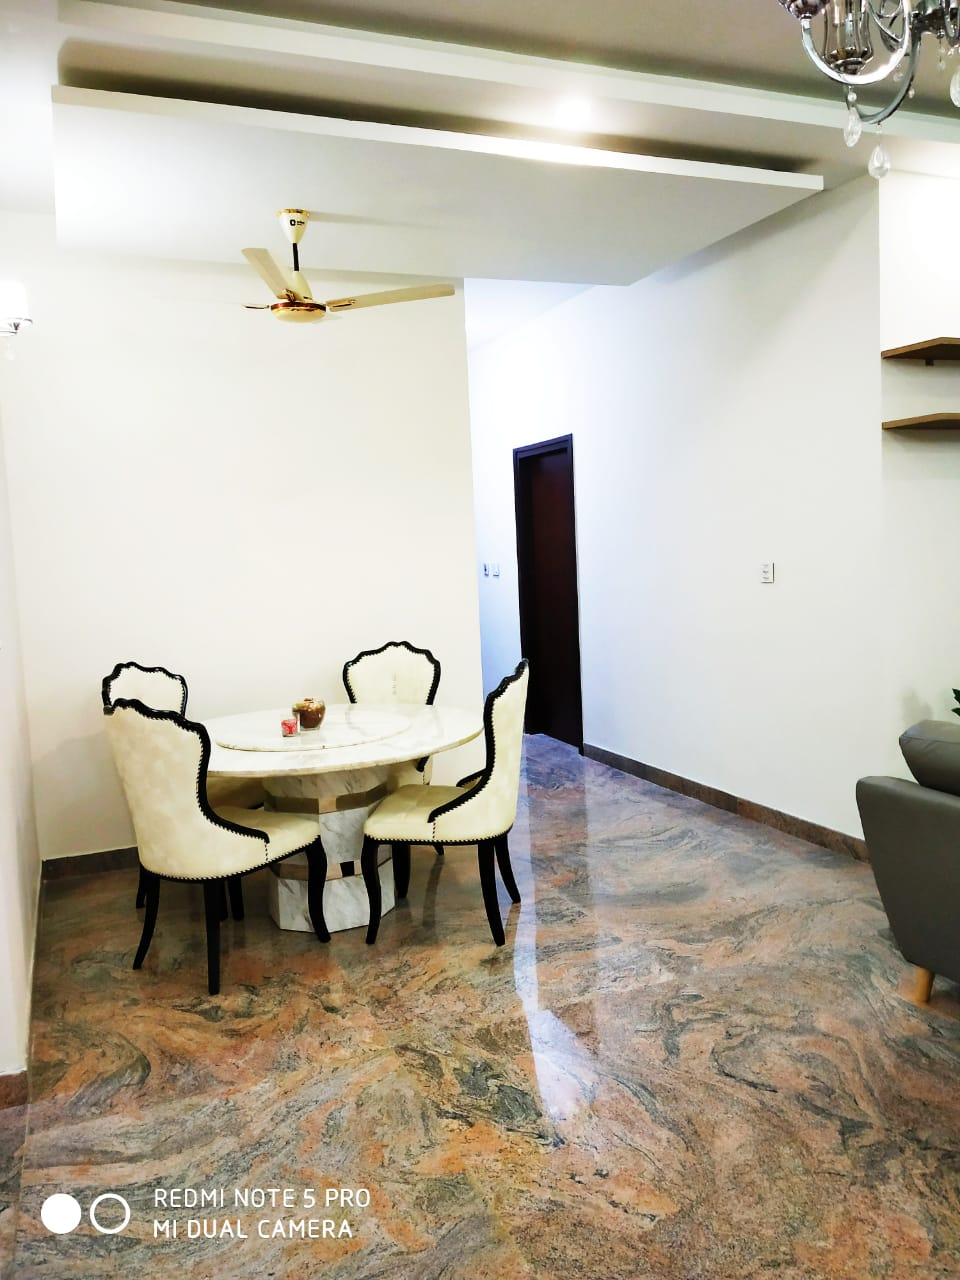 BSCPL-Bollineni-Astra-Kogilu-Cross-Apartments-Bangalore-Gallery-5